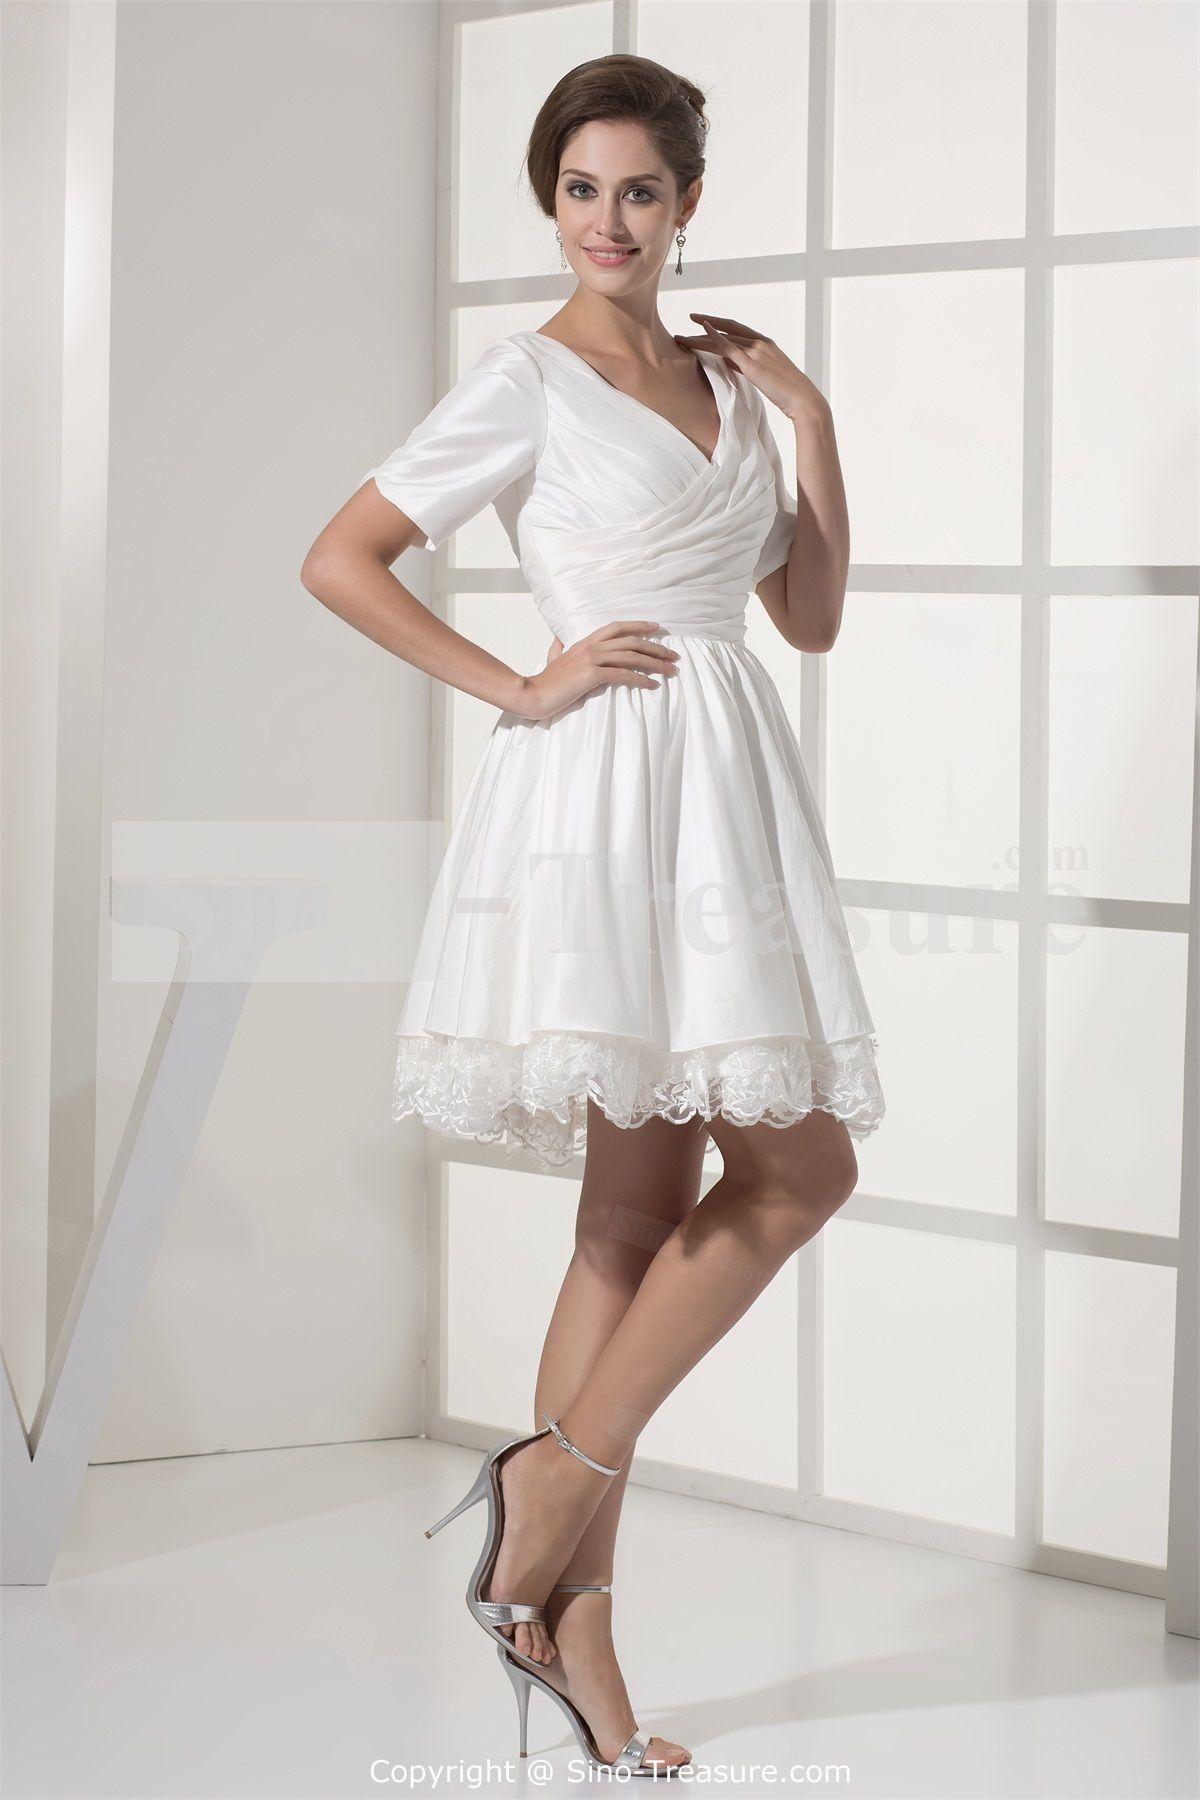 White ALine Taffeta Vneck Short Reception Wedding Dress